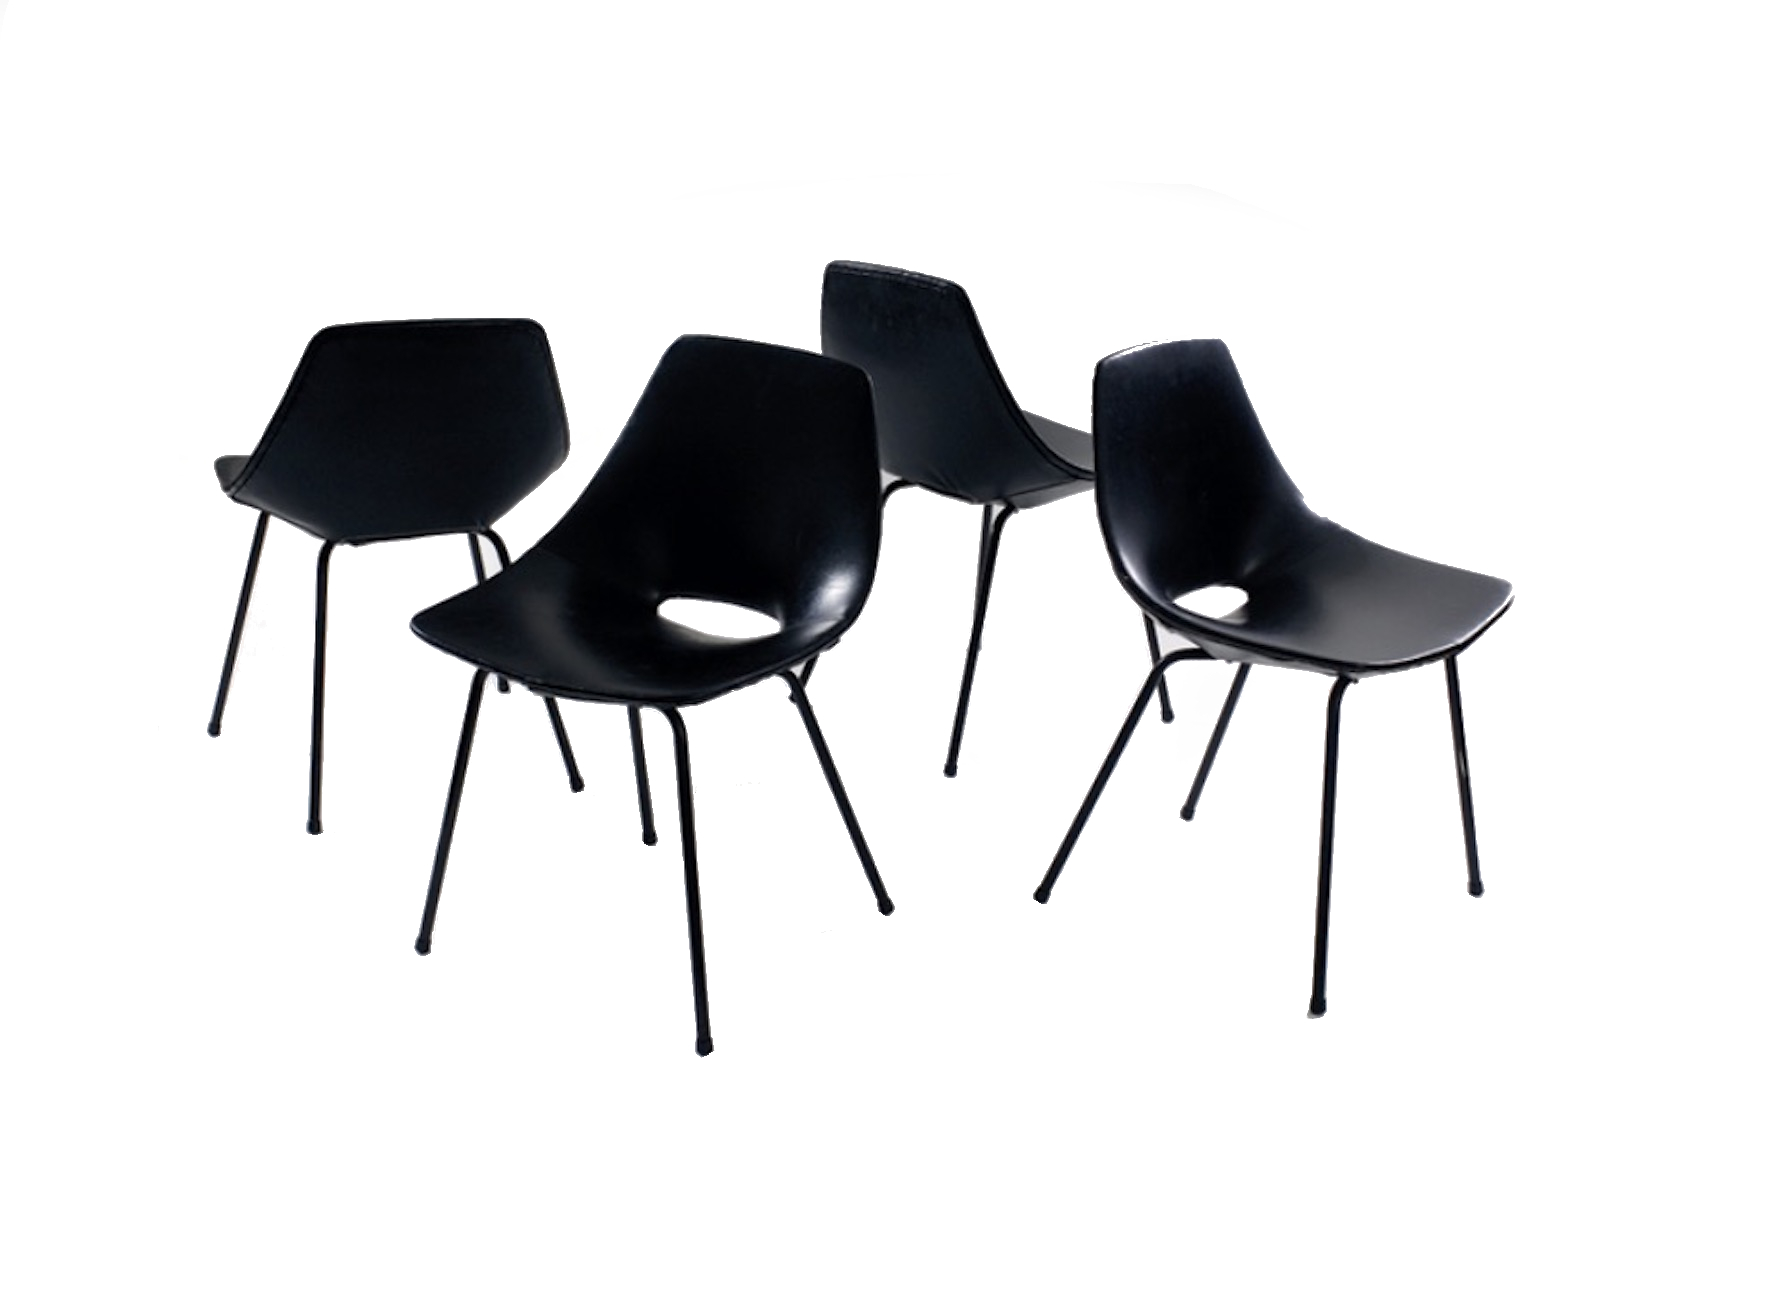 pierre guariche galerie arts modernes. Black Bedroom Furniture Sets. Home Design Ideas